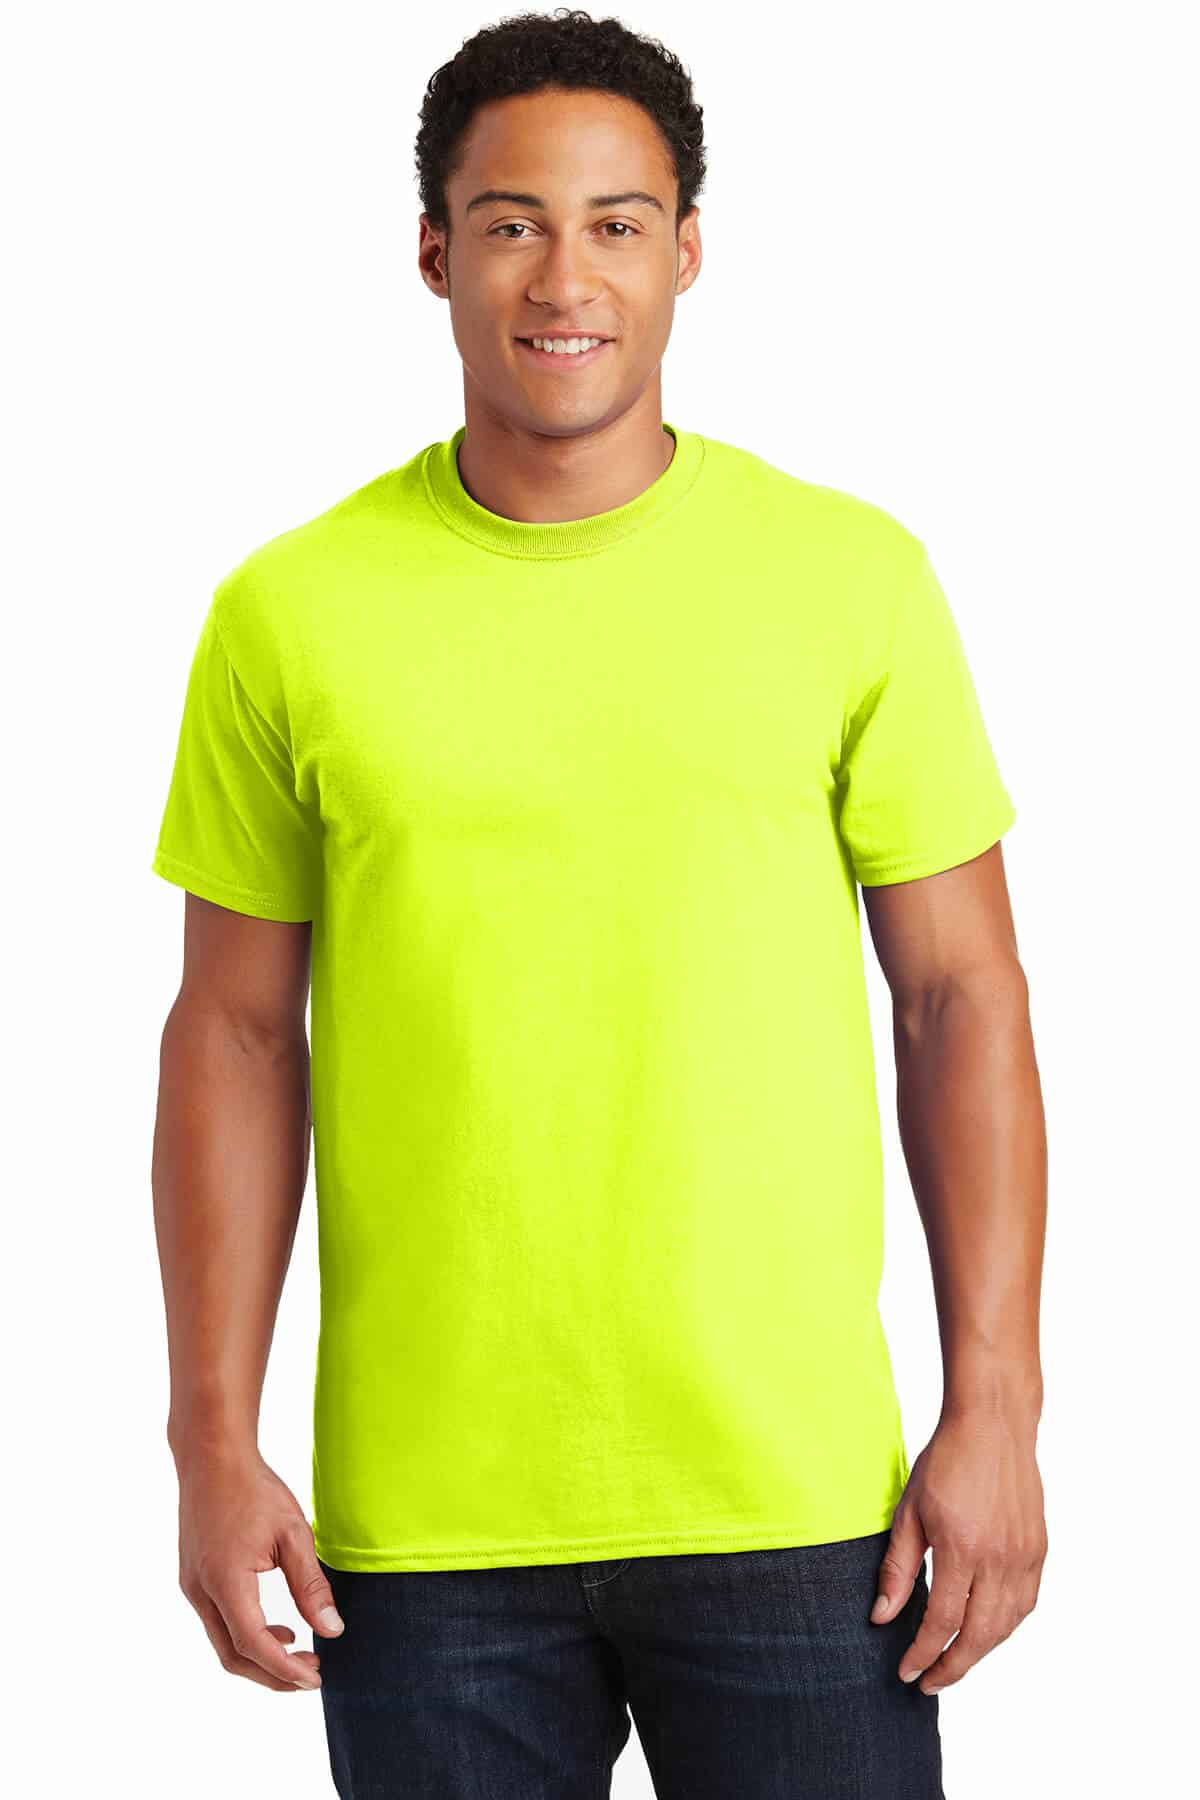 Safety Green Teeshirt Front